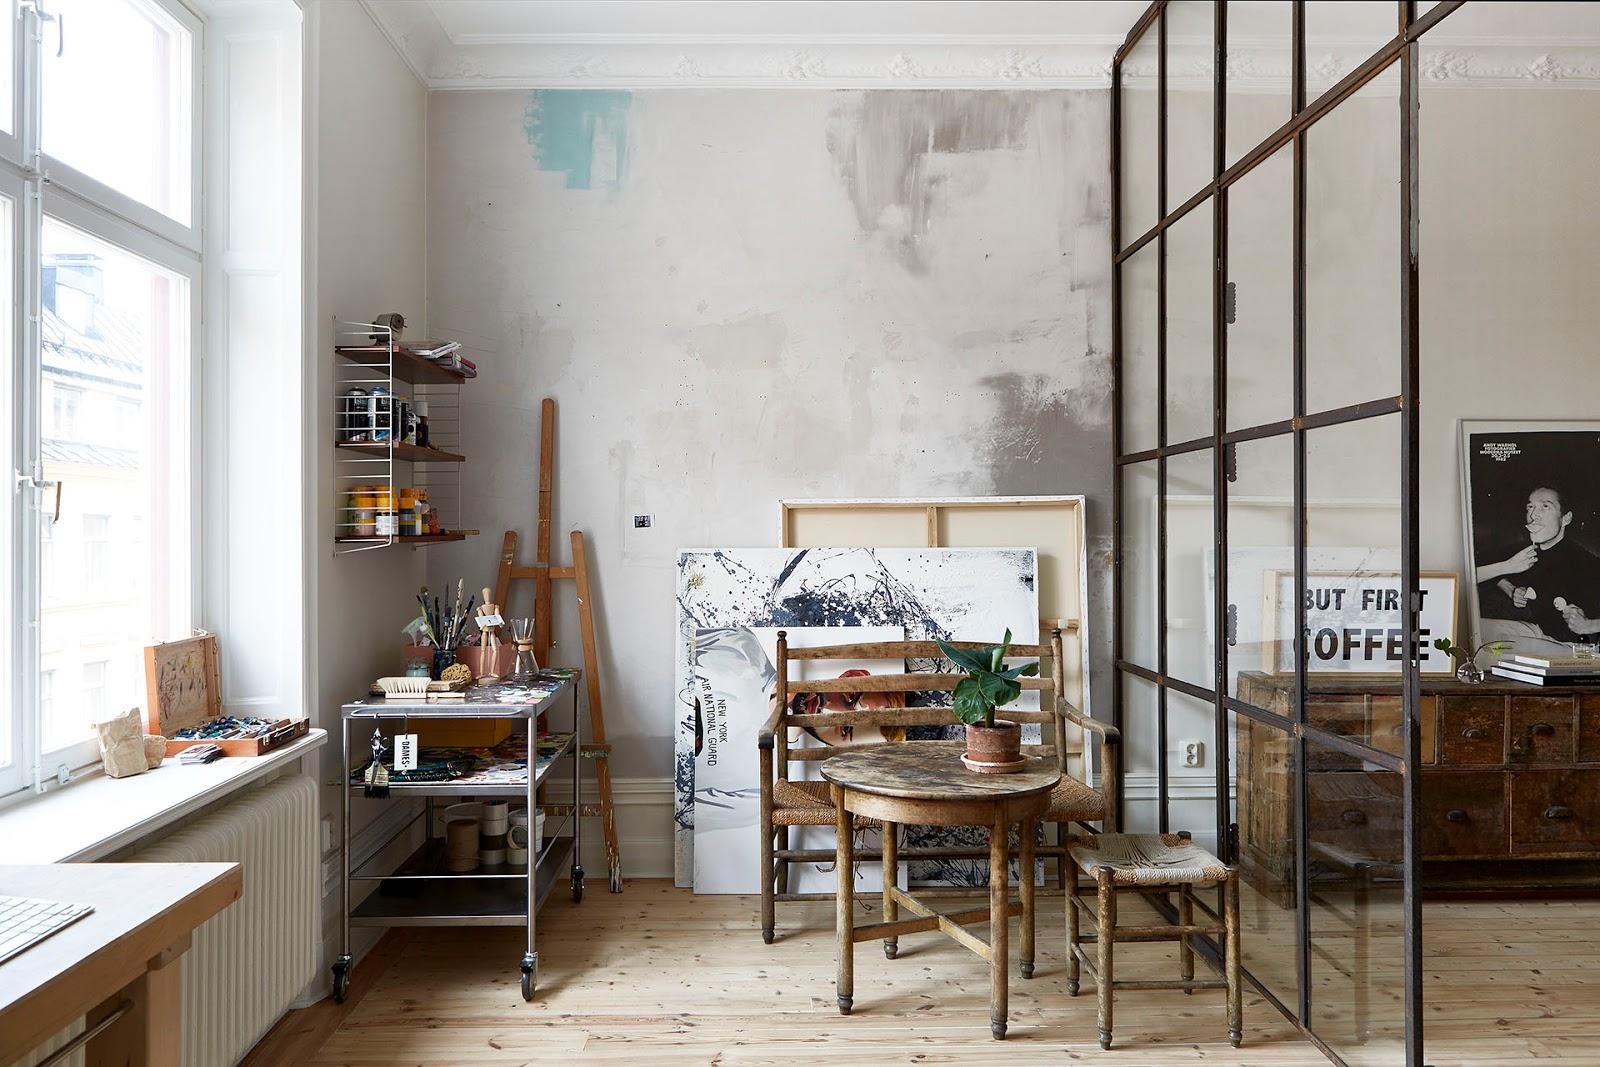 Home car cter industrial en mini loft virlova style - Estilos de interiorismo ...